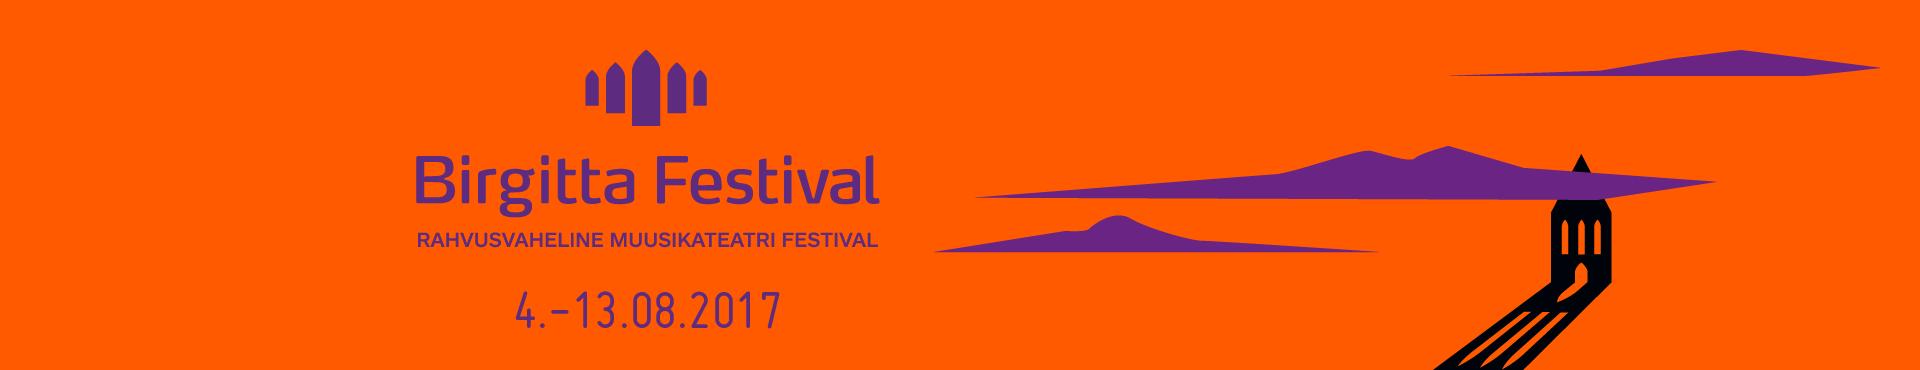 Birgitta Festival 2017 imago est